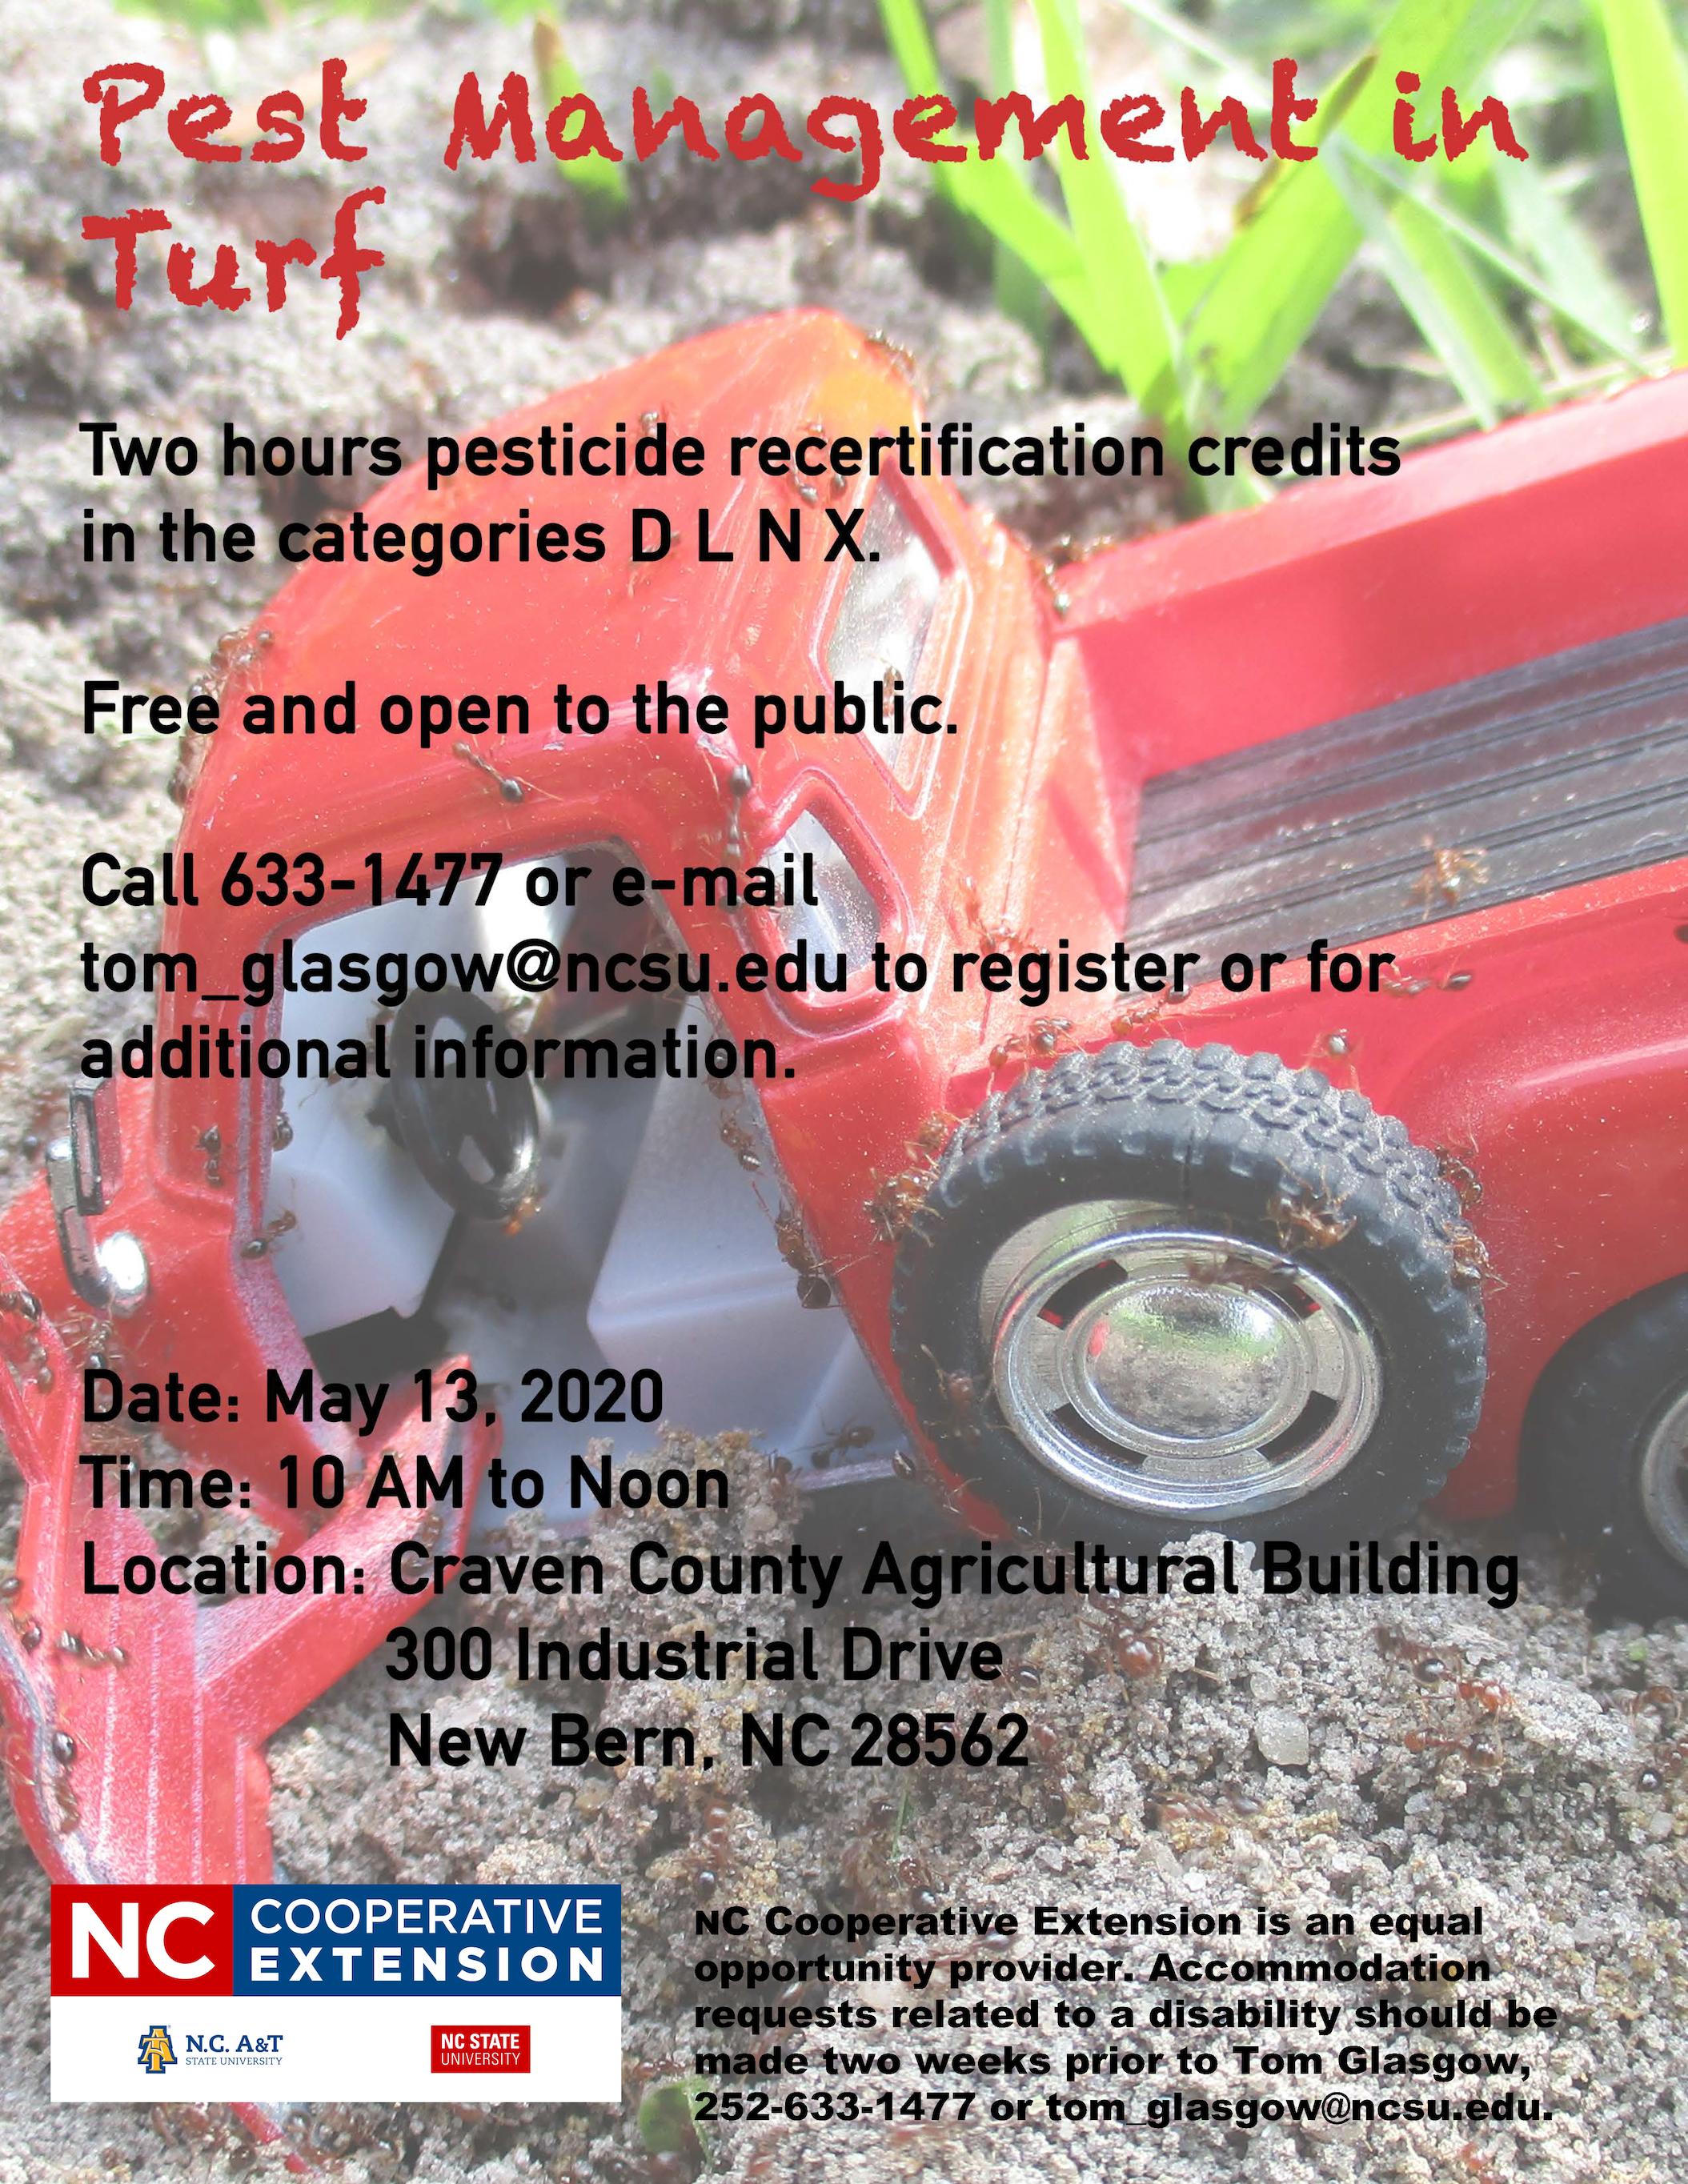 Pest Management in Turf flyer image